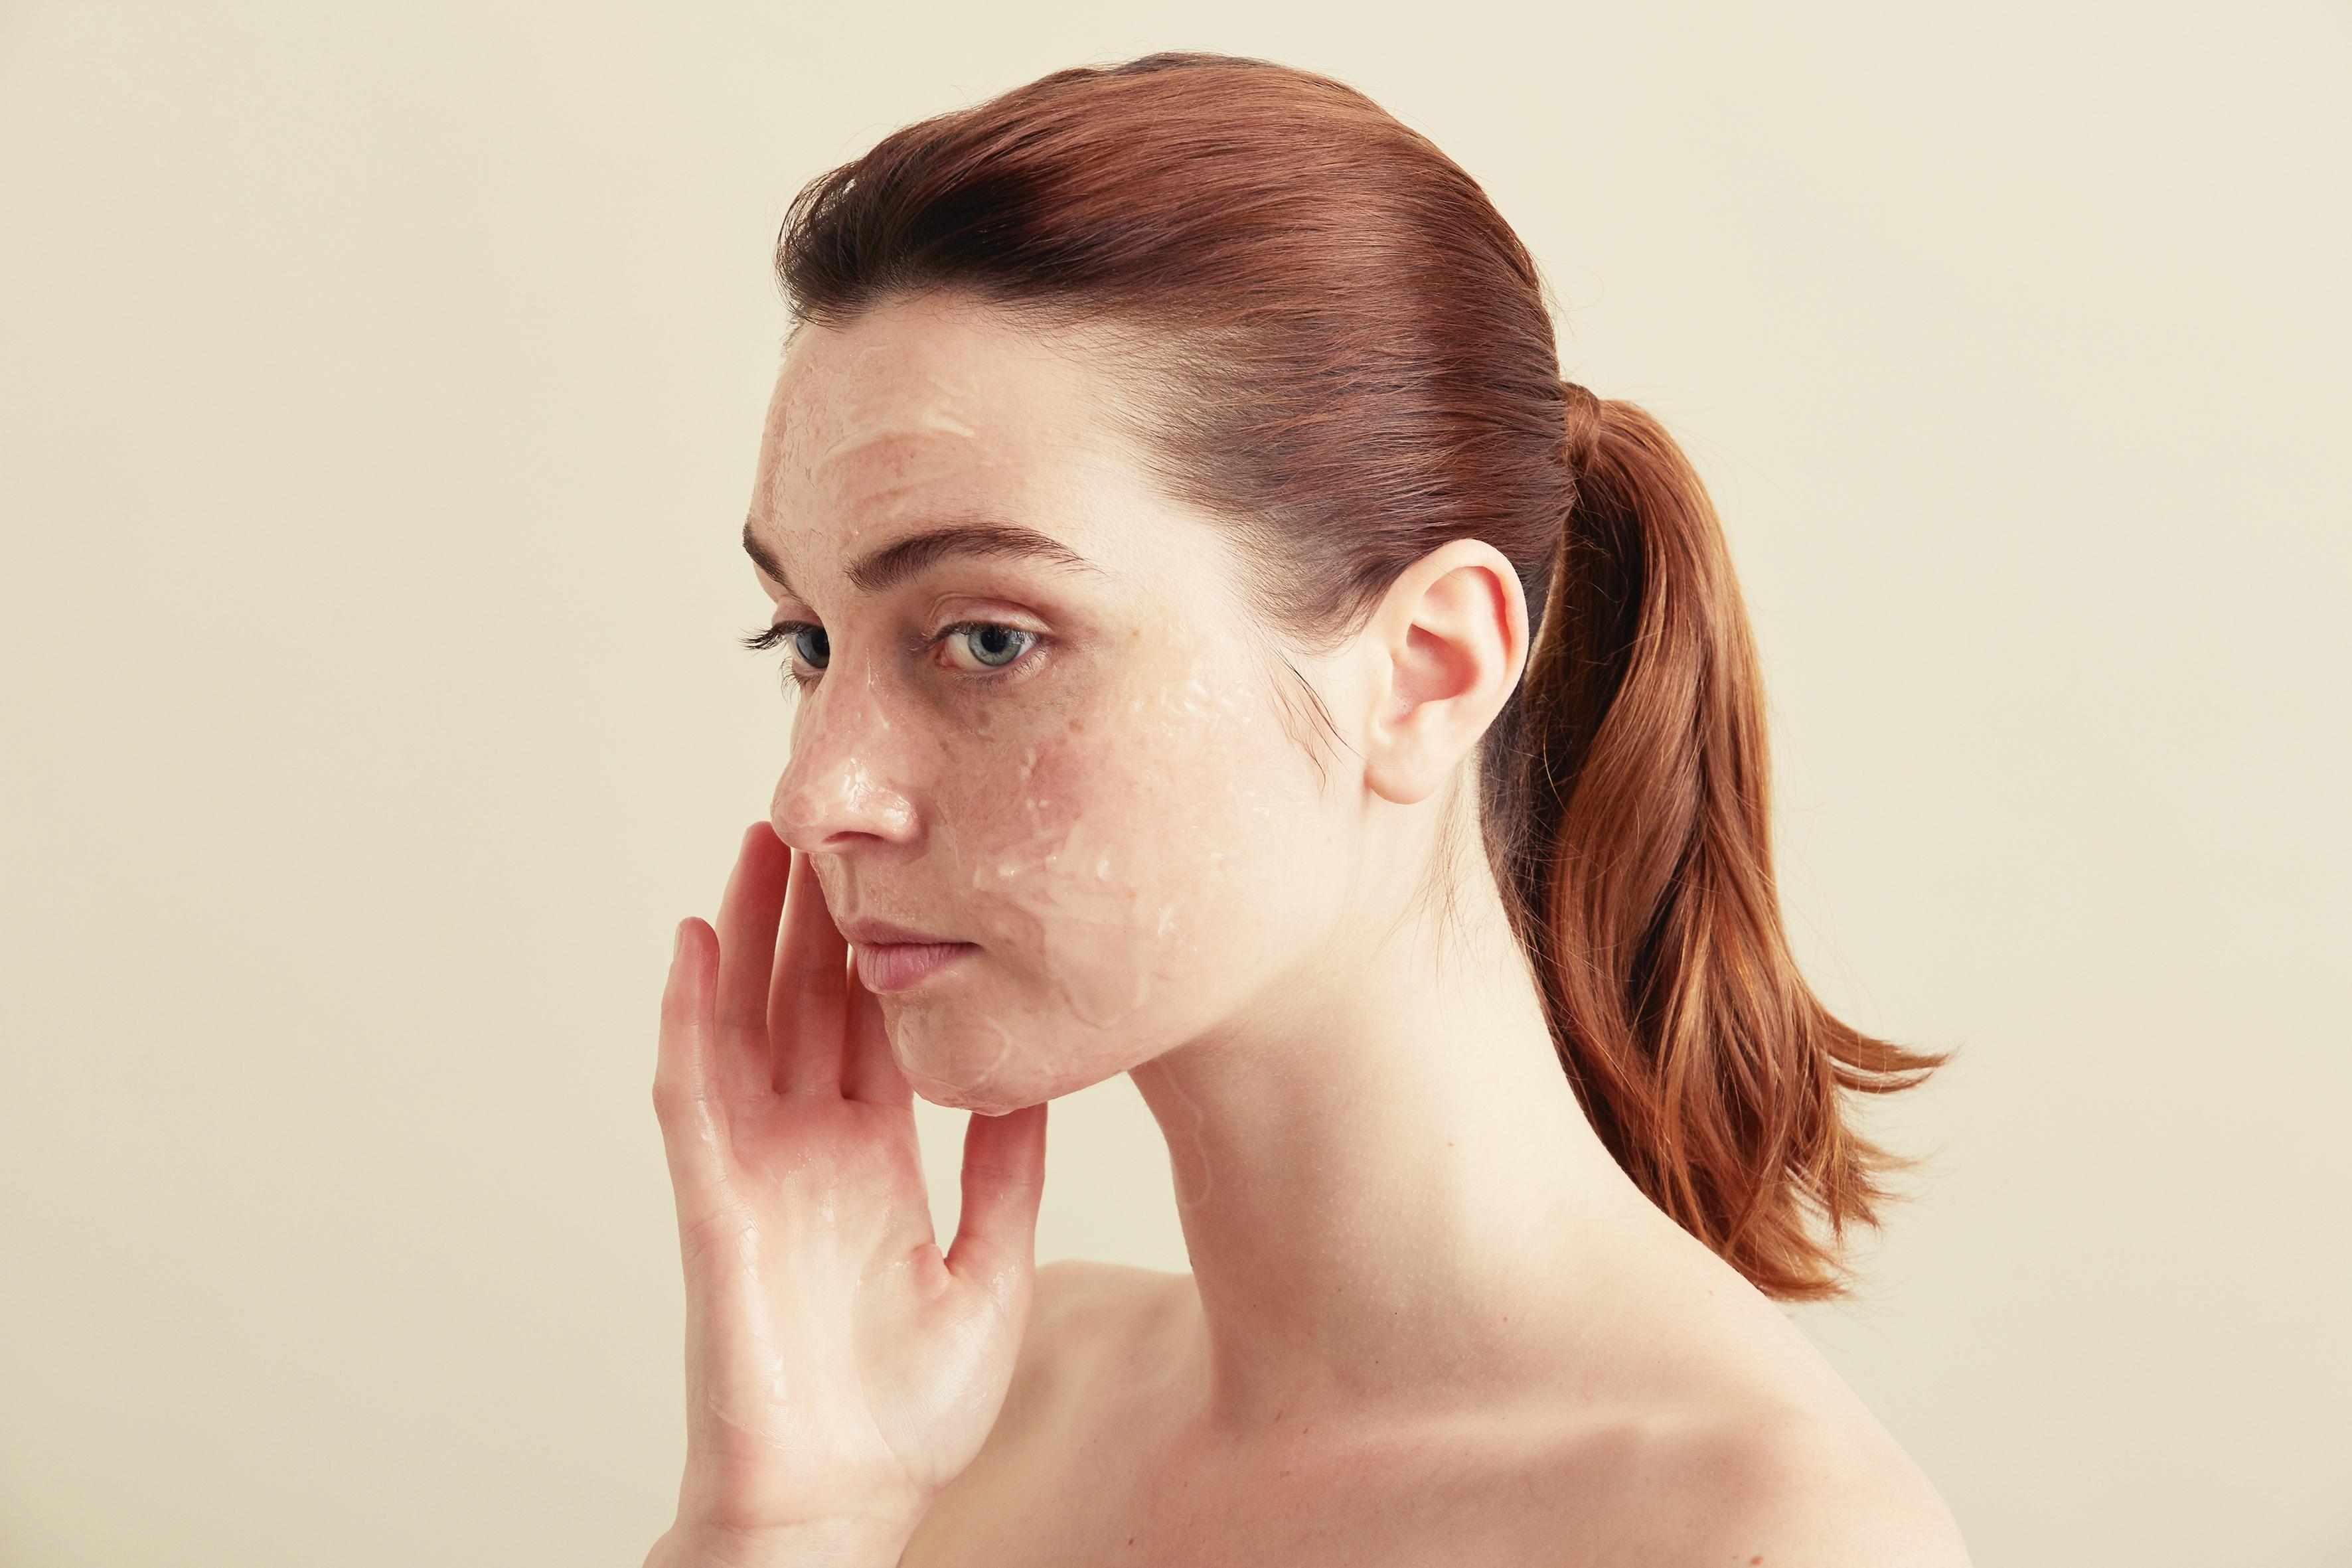 Dupla Limpeza: Porque deves utilizar este método na tua rotina de pele?